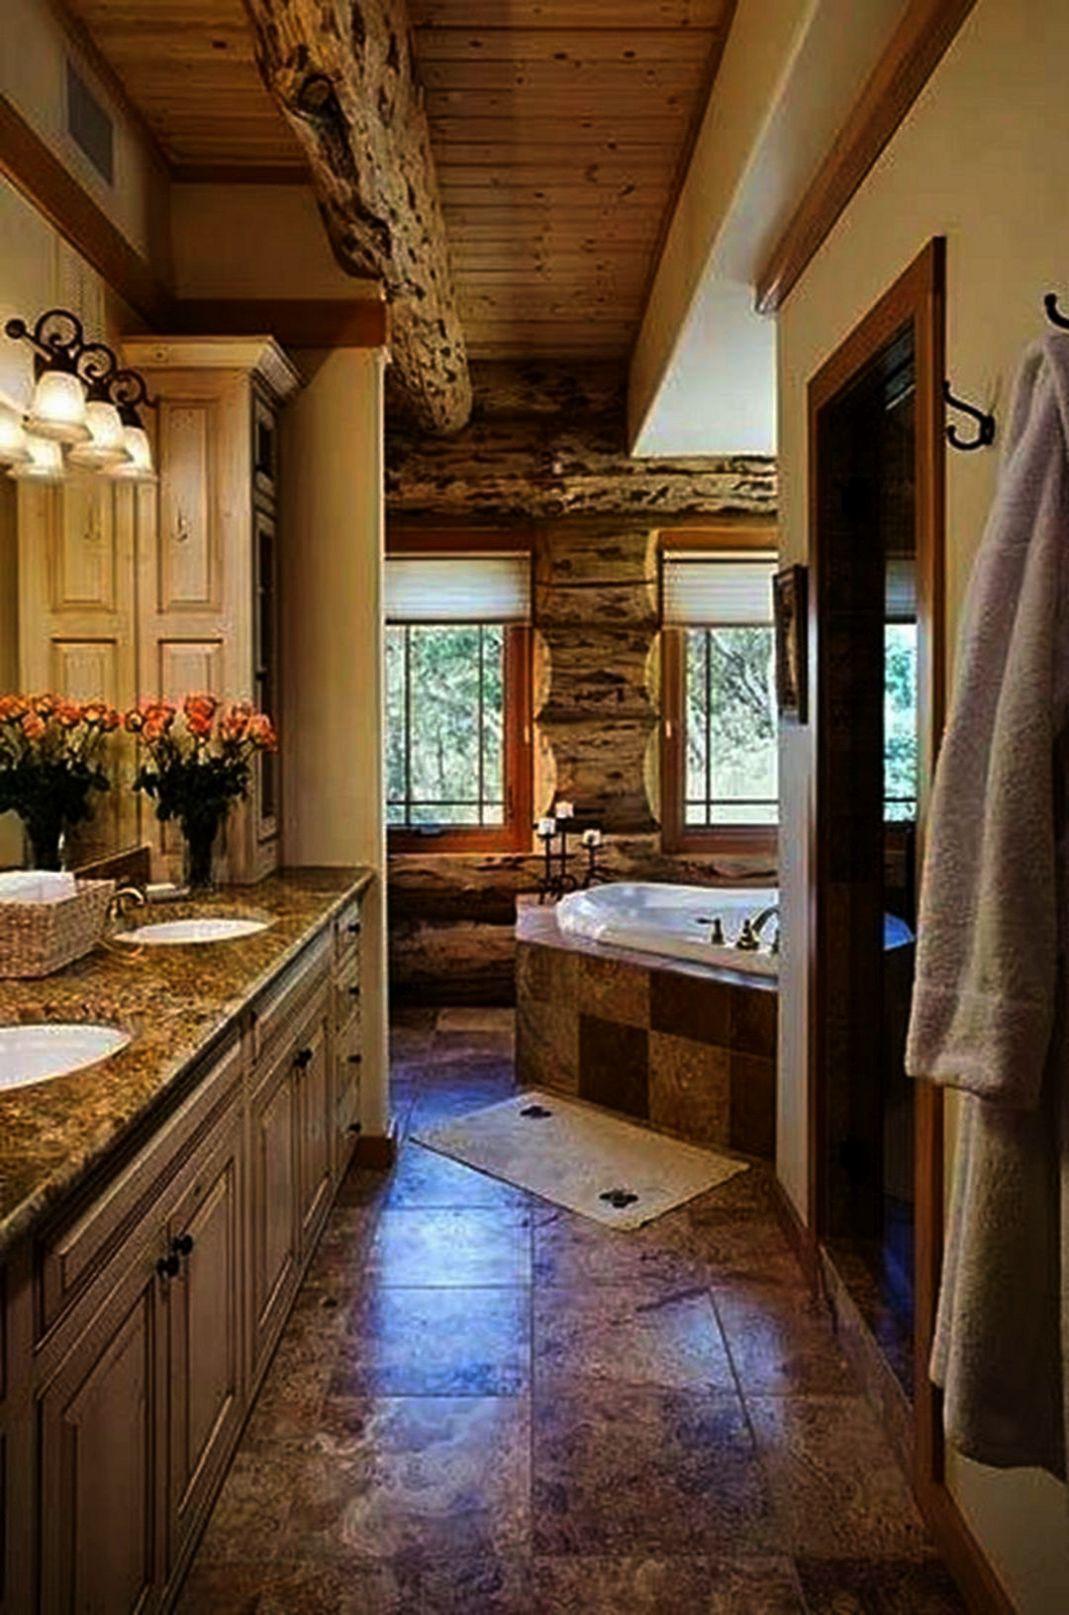 Bathroom Storage Accessories following Bathroom Remodel ...